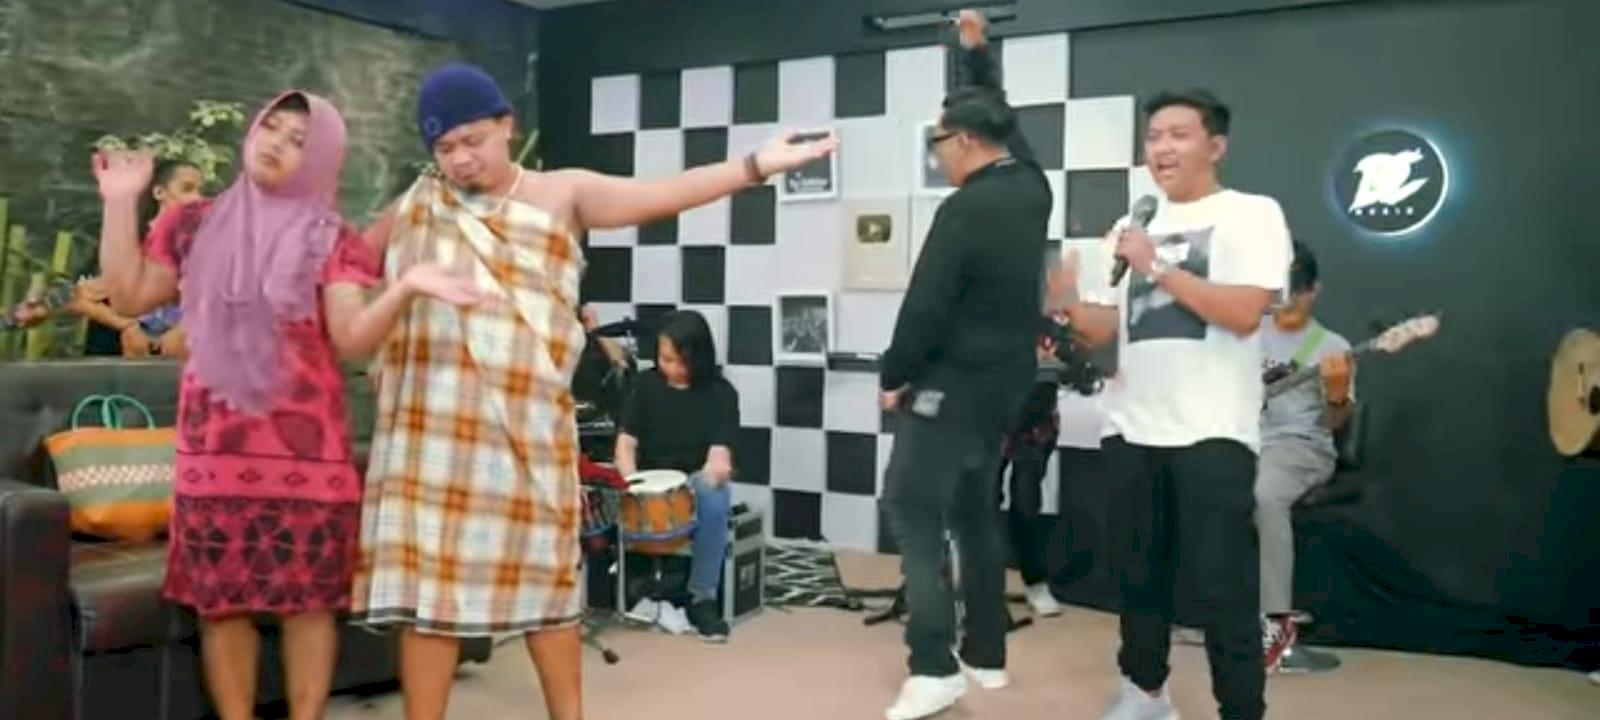 Lagu Mendung Tanpo Udan feat Ndarboy Genk - Denny Caknan Trending di Youtube